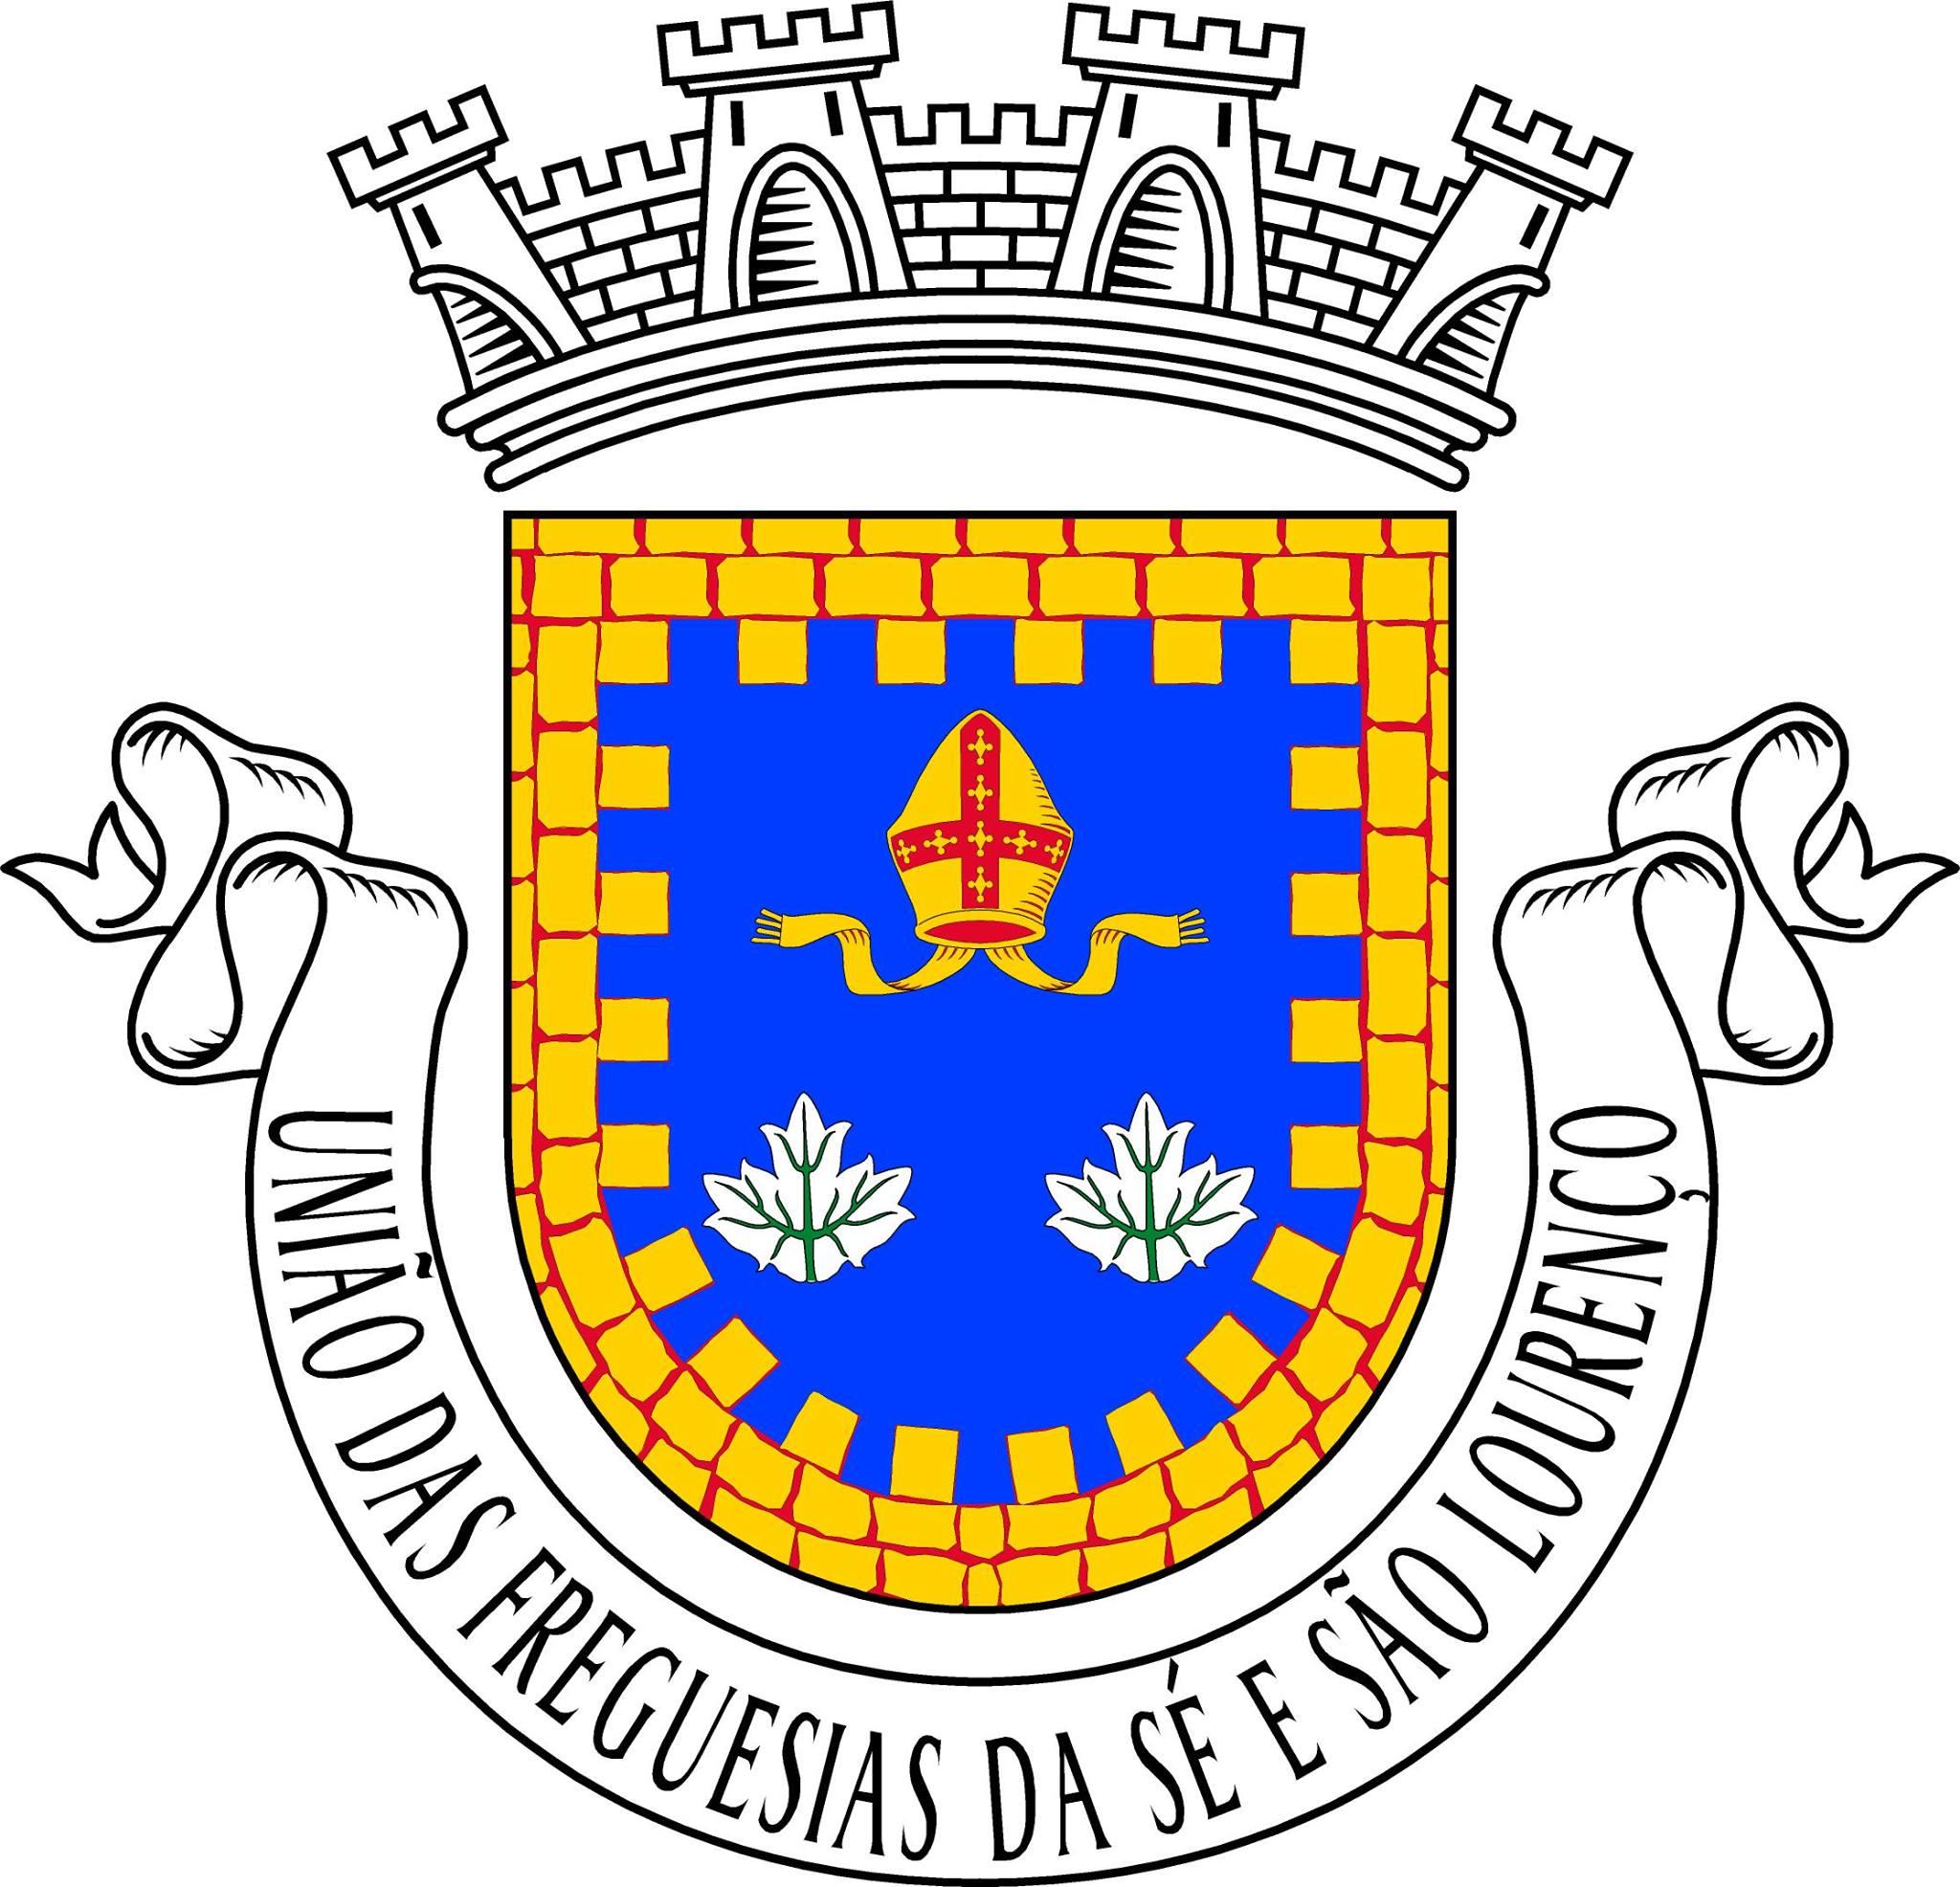 Brazão Junta Sé